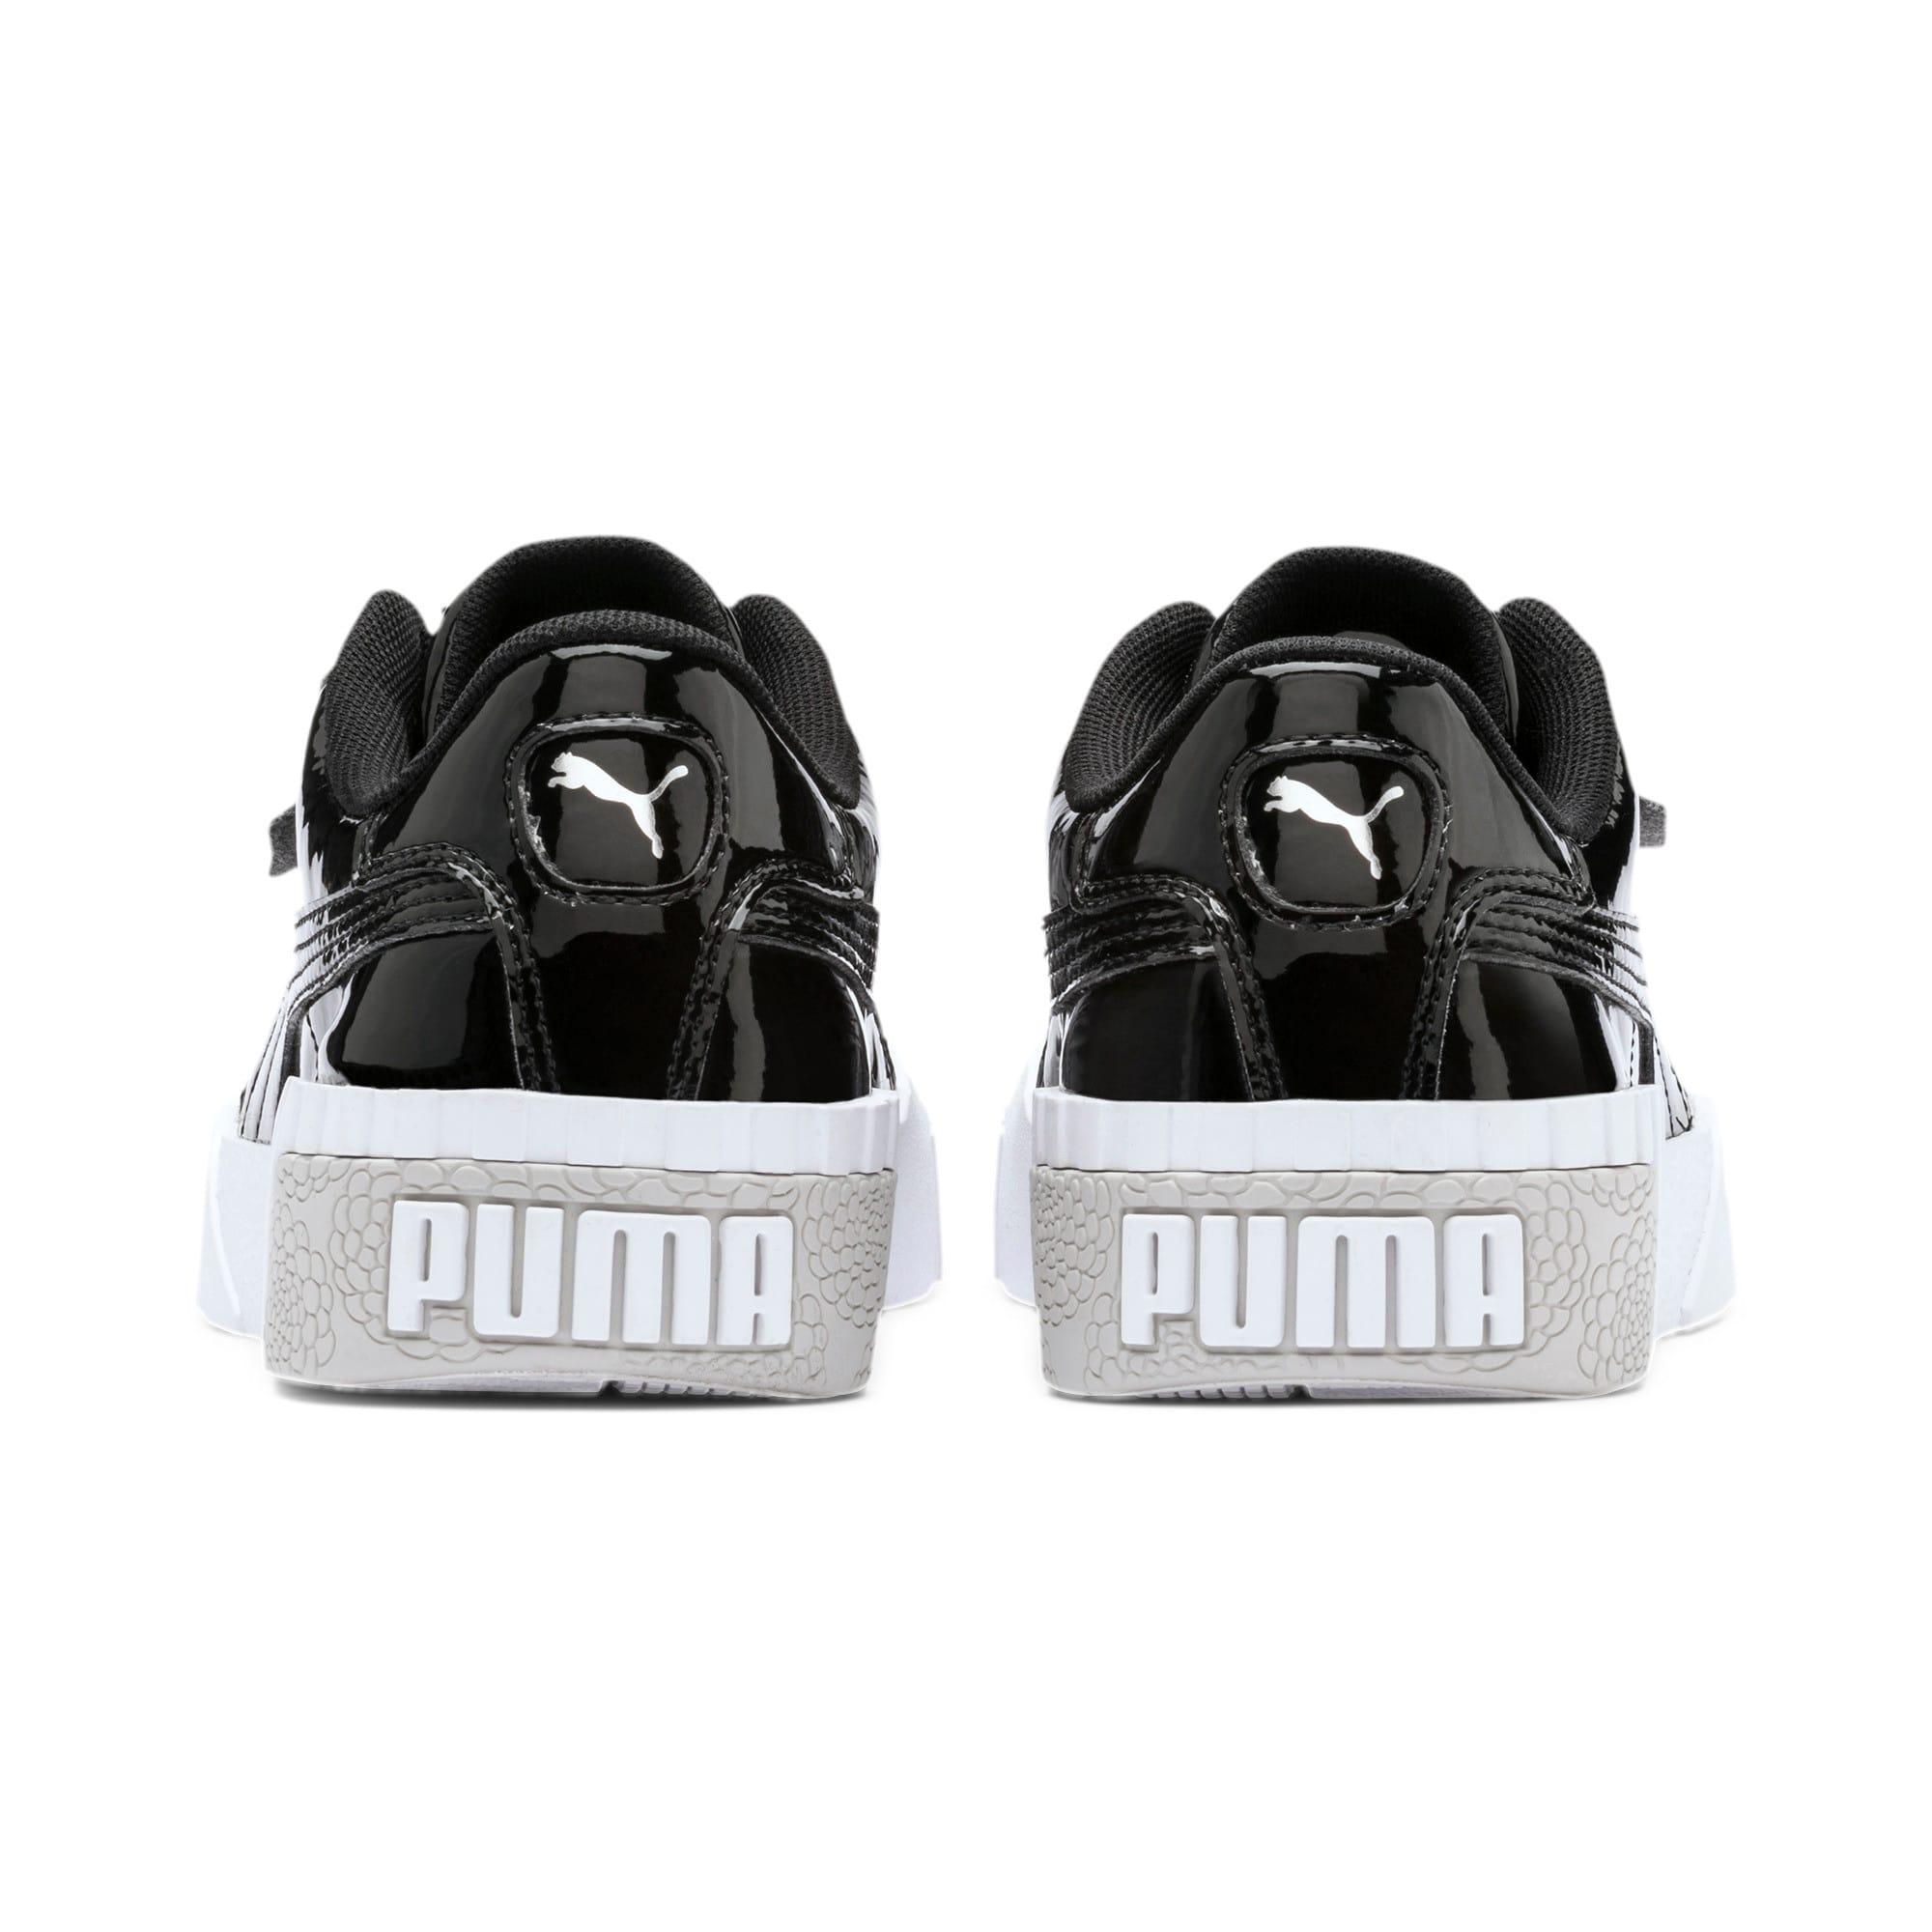 Thumbnail 3 of Cali Patent Youth Trainers, Puma Black-Puma White, medium